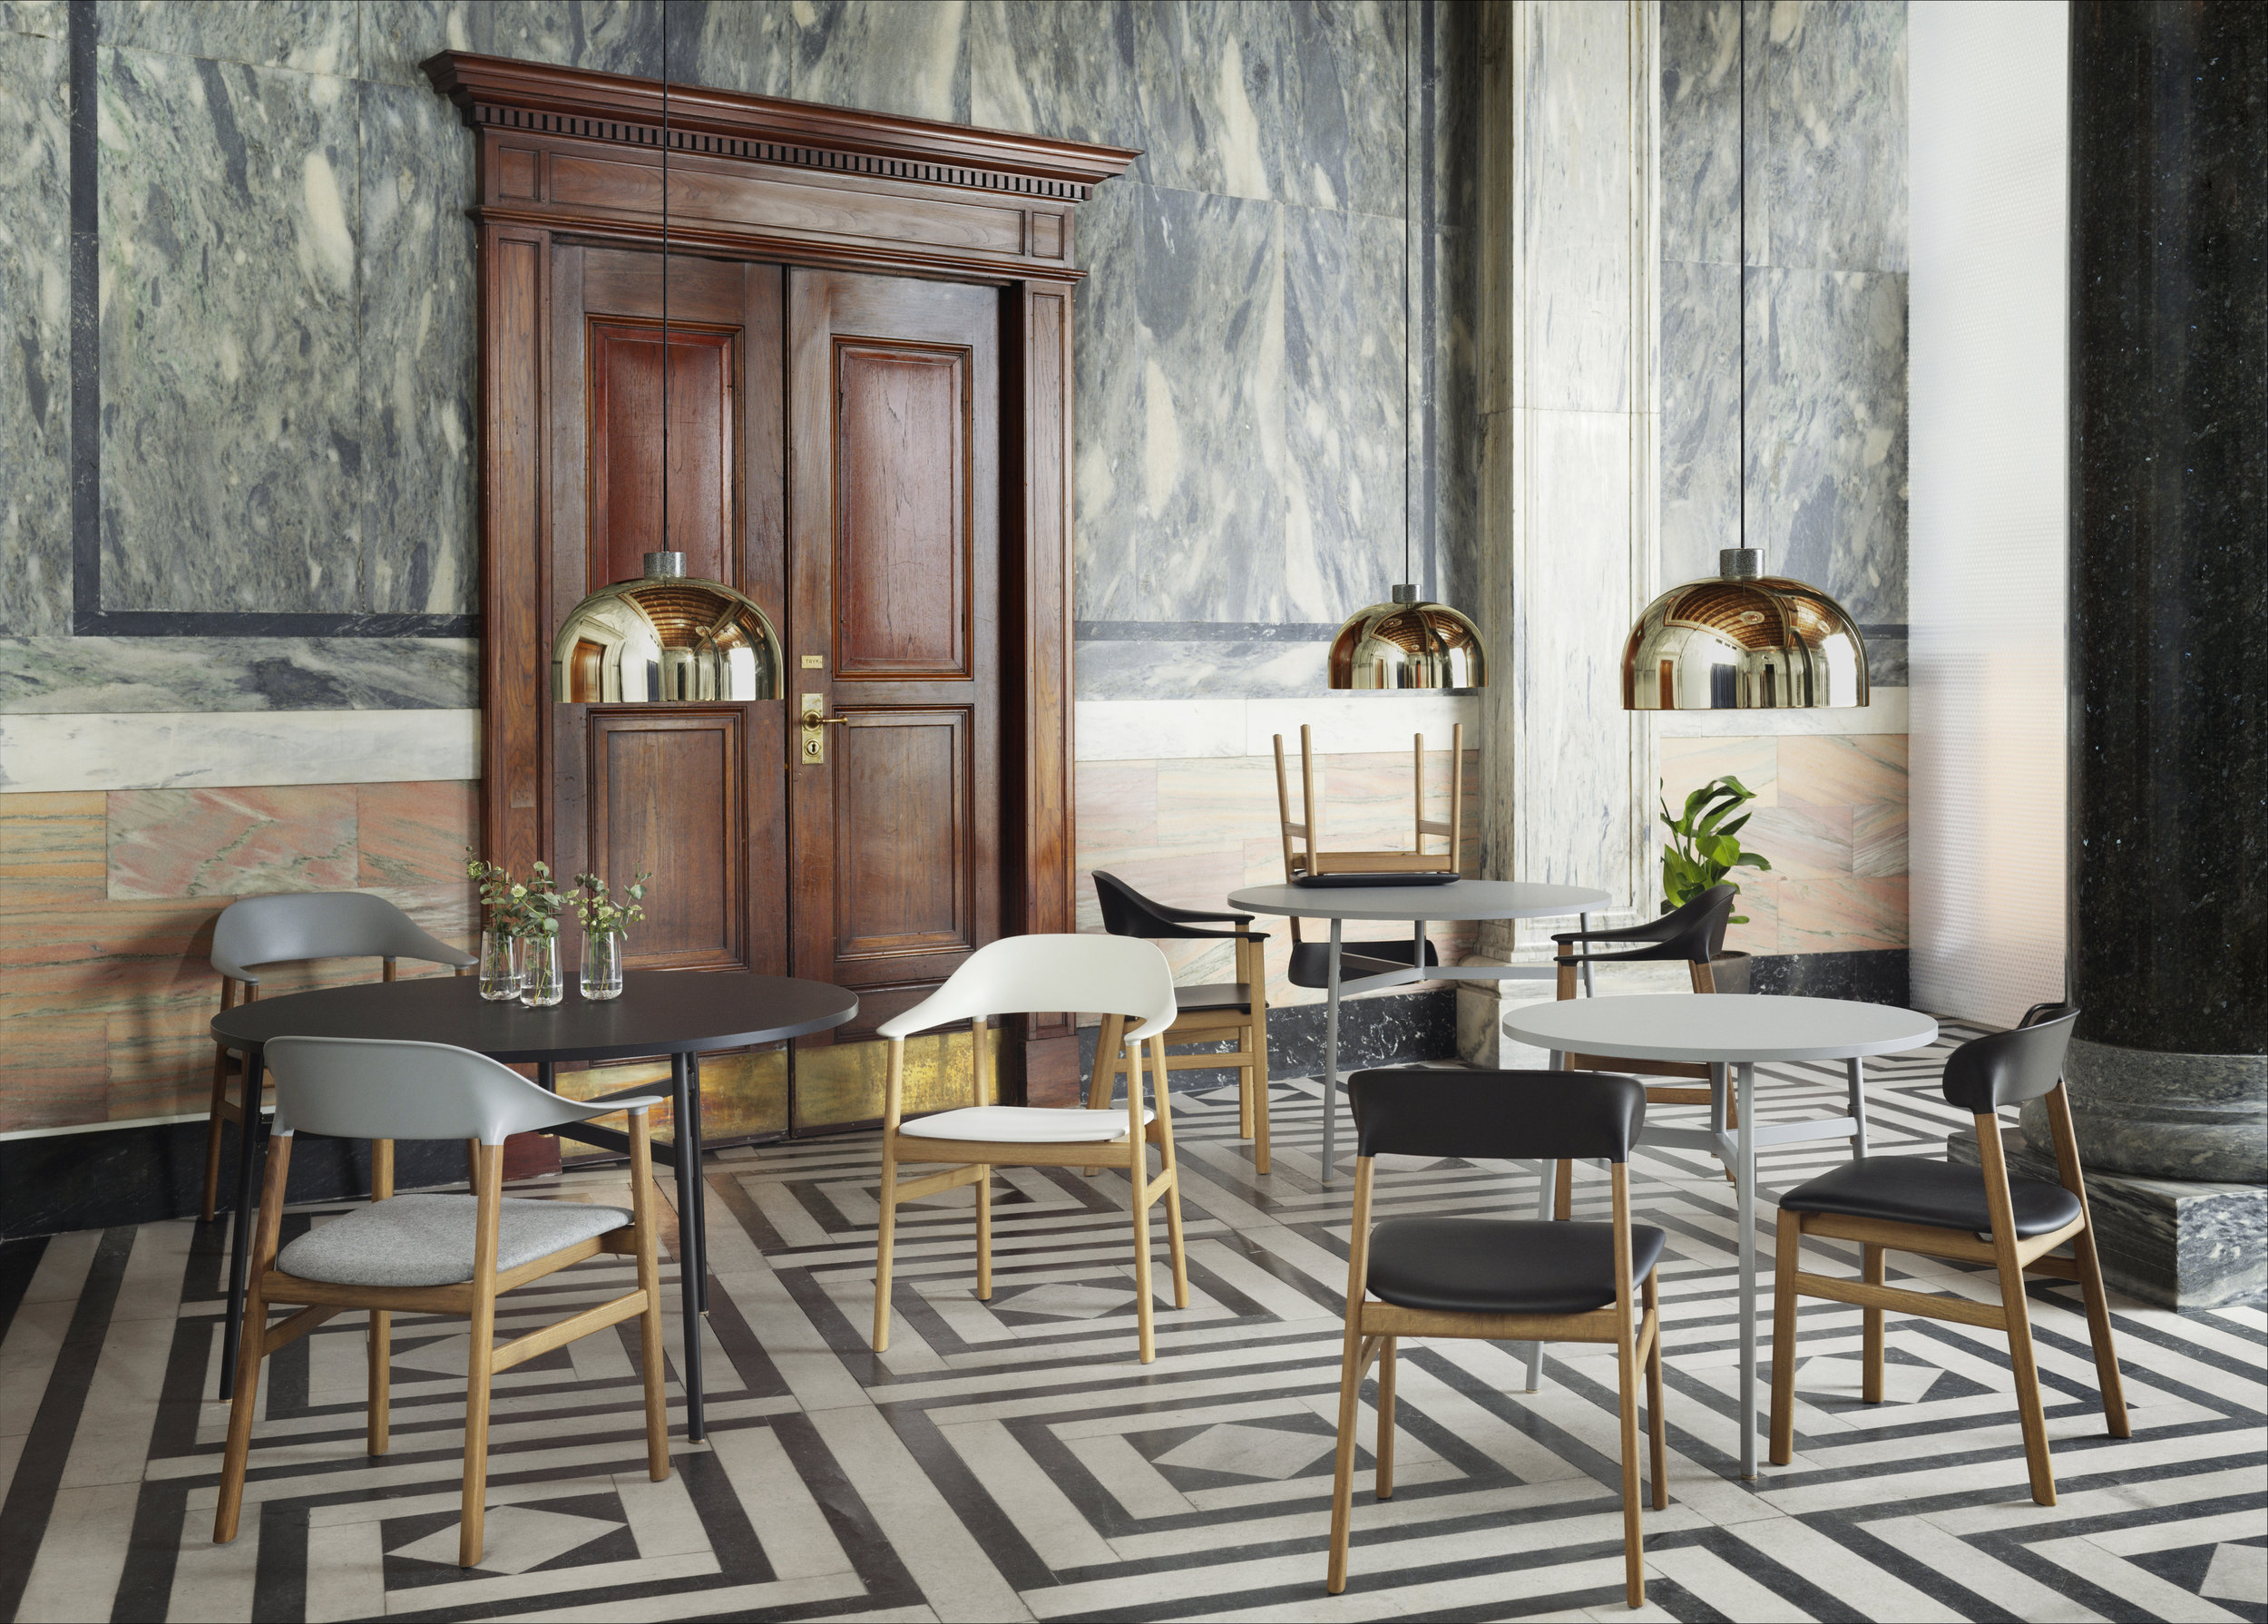 New collection - Union Table, Herit Chair Oak, Grant Pendant by Norman Copenhagen